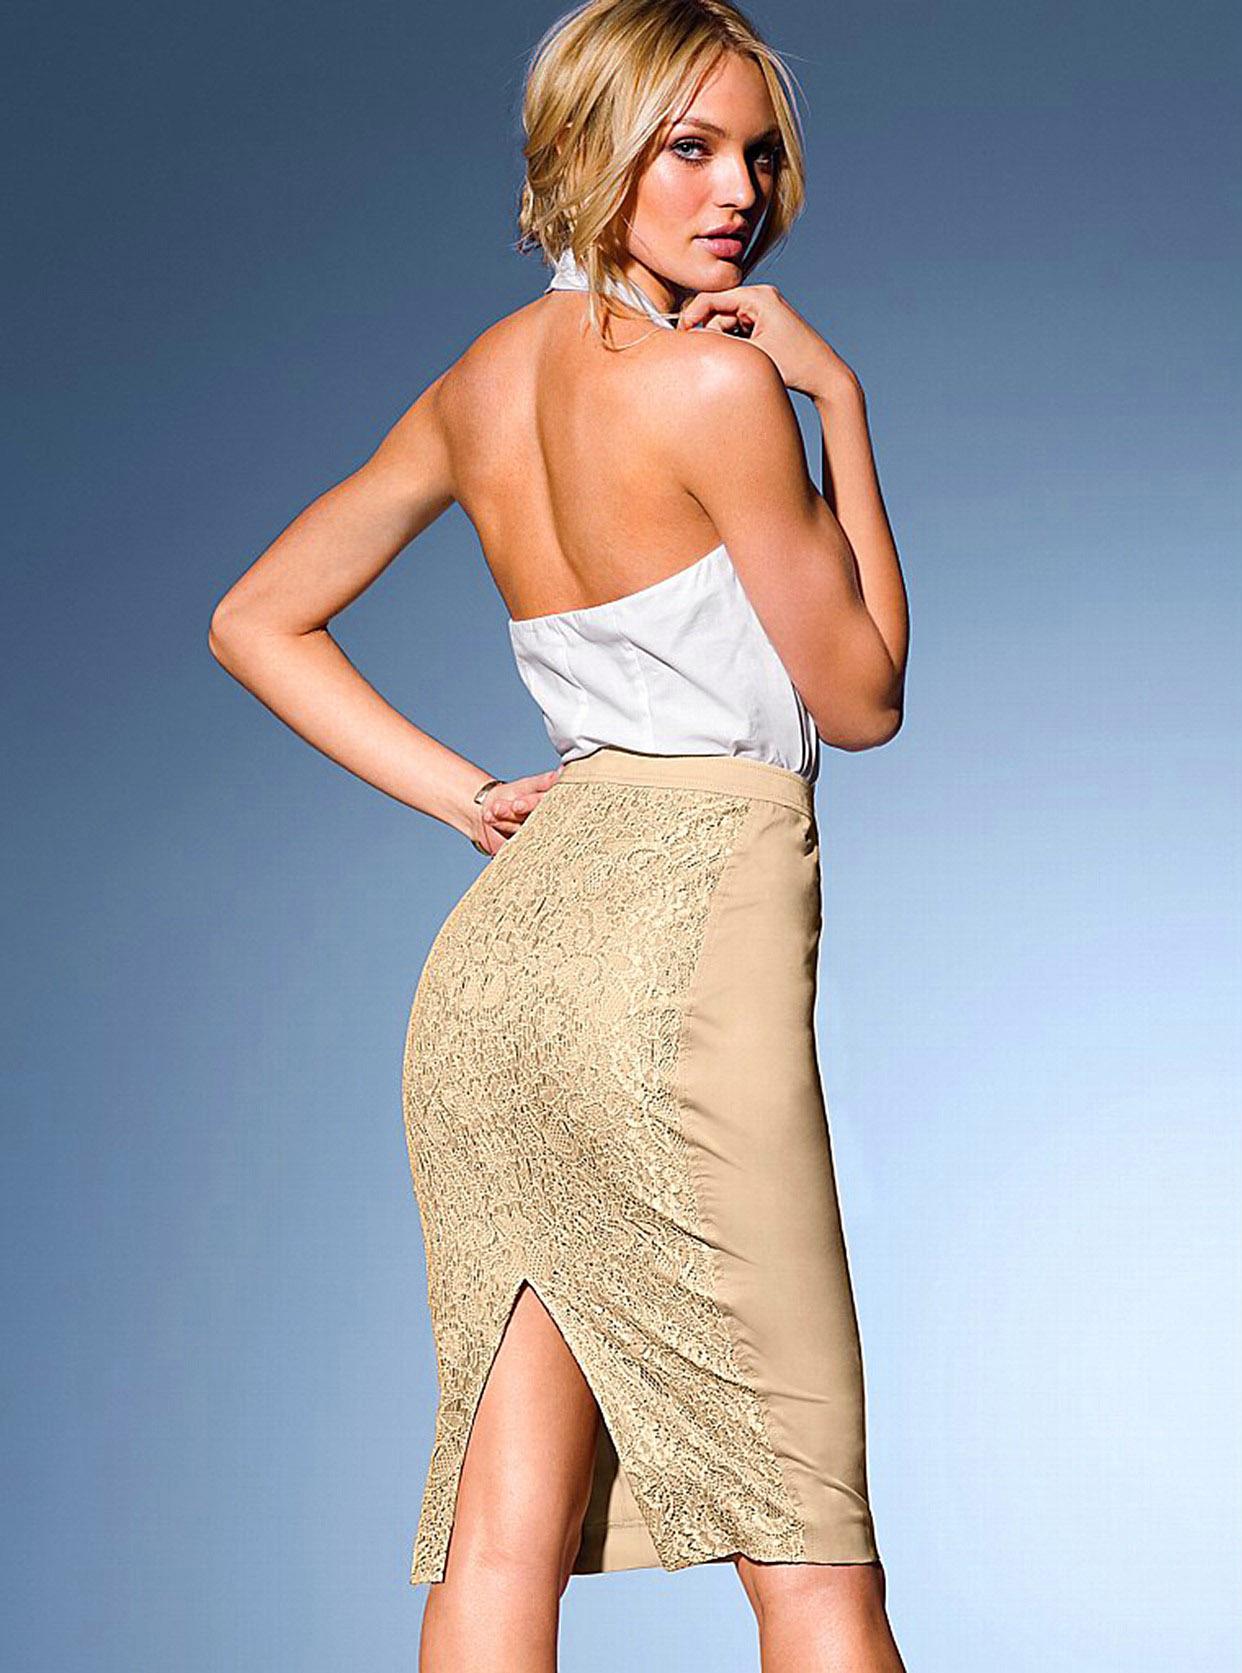 Юбки с разрезом чулки фото женщины 10 фотография